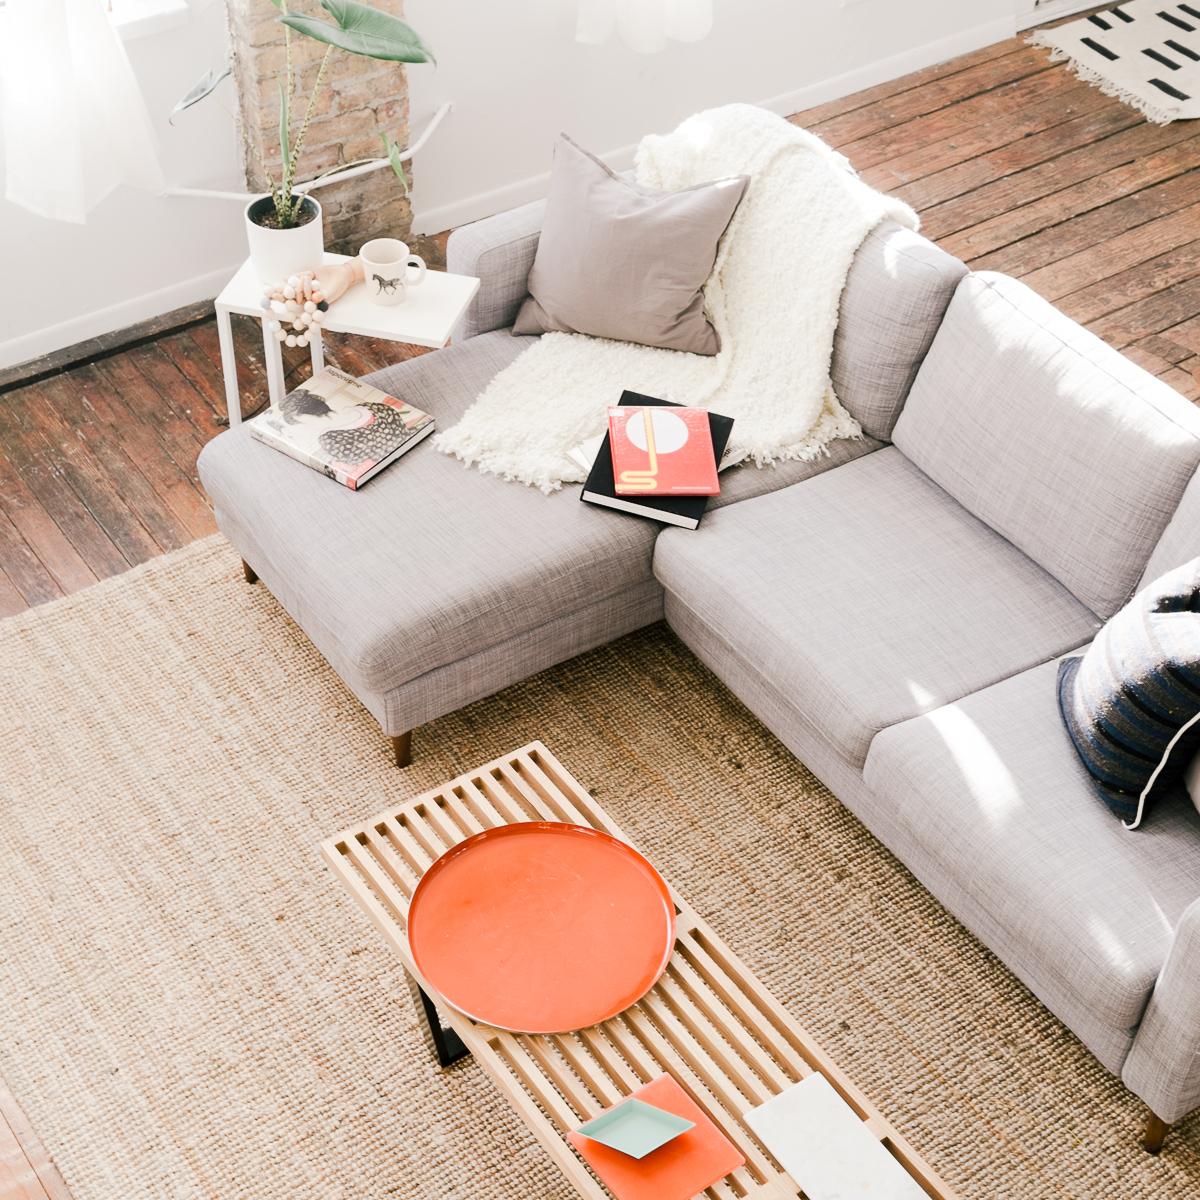 katrina_hoernig_interior_prop_designer_stylist_chicago.jpg